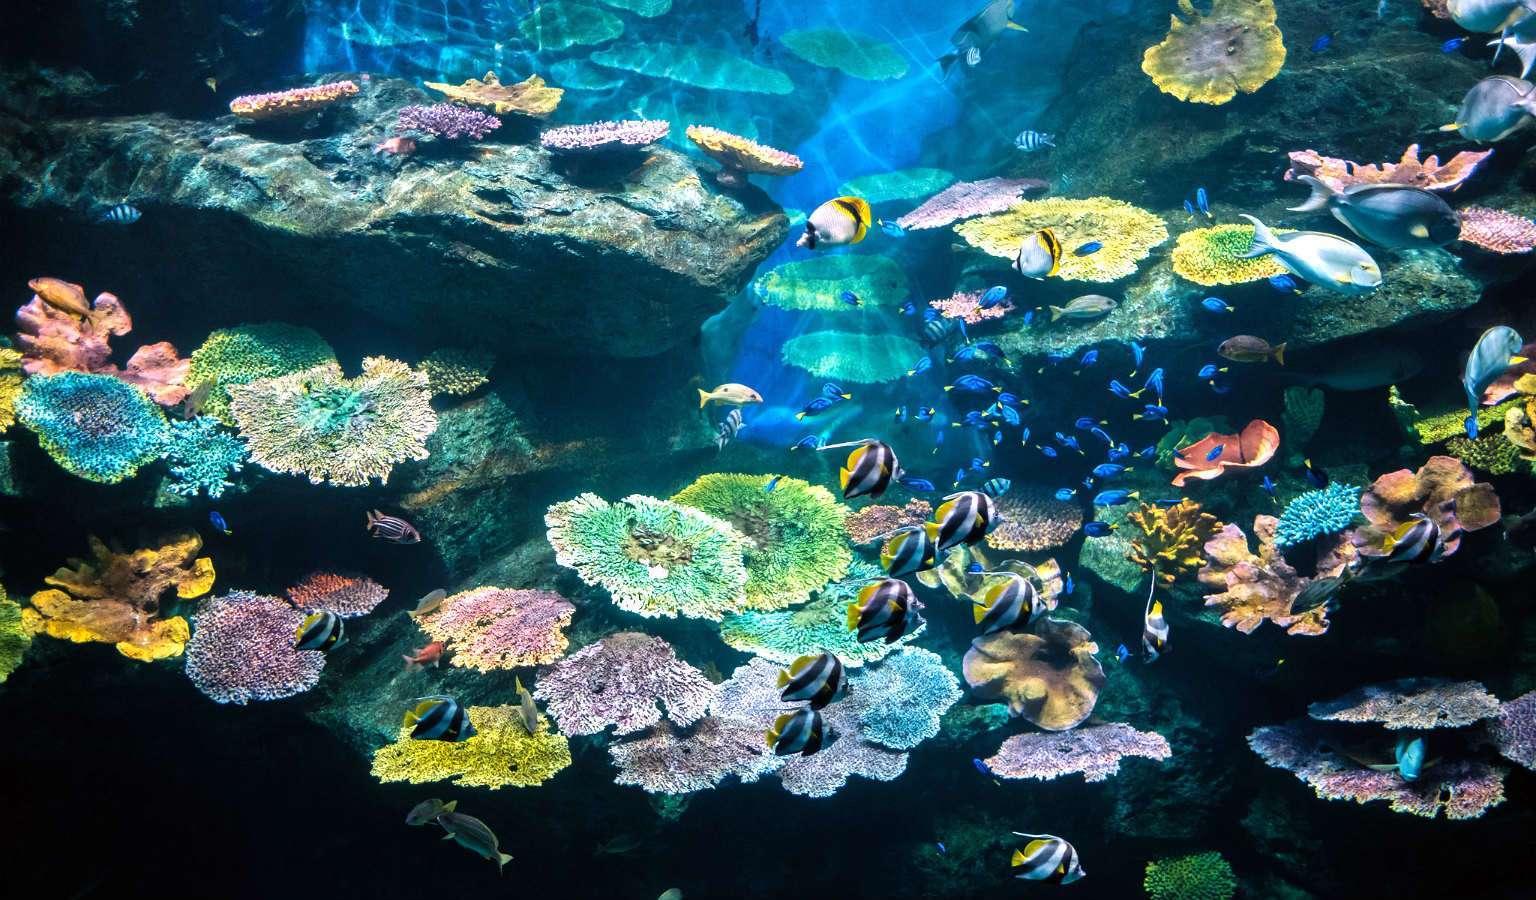 Sea Life Bangkok, large Aquarium in Bangkok